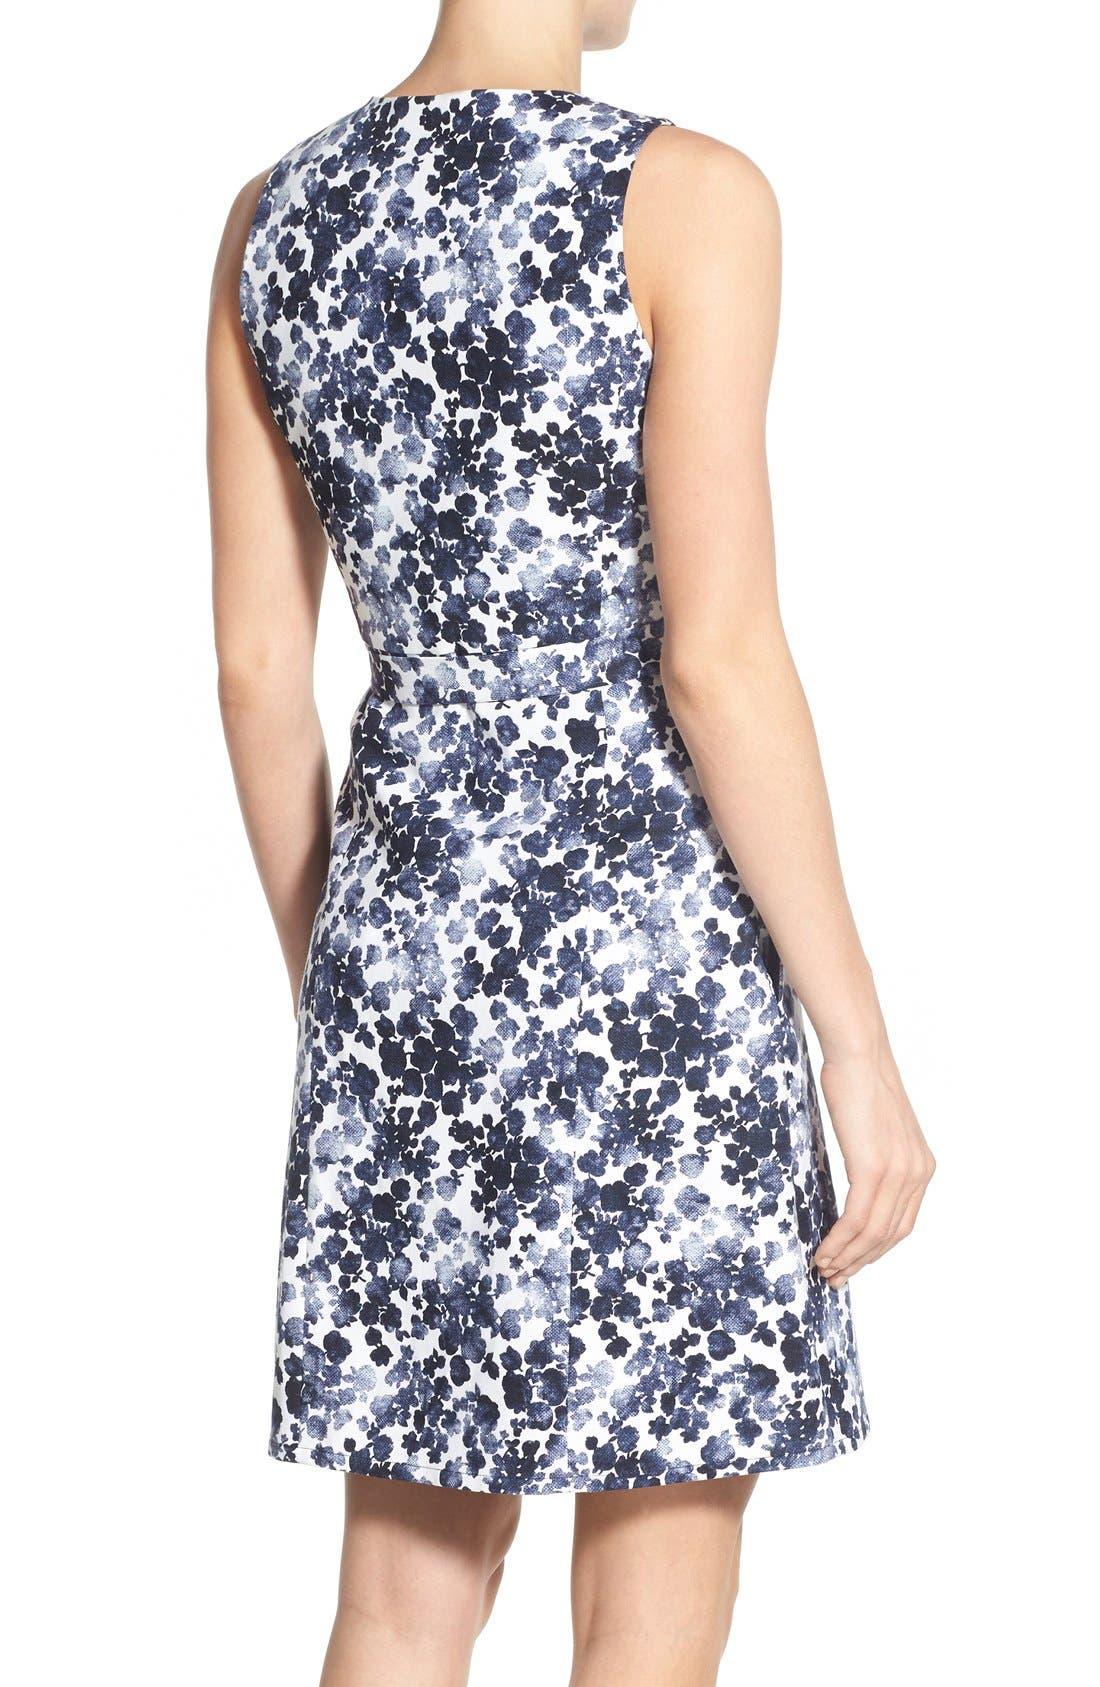 Alternate Image 3  - MICHAEL Michael Kors 'Gemma' Print Belted A-Line Dress